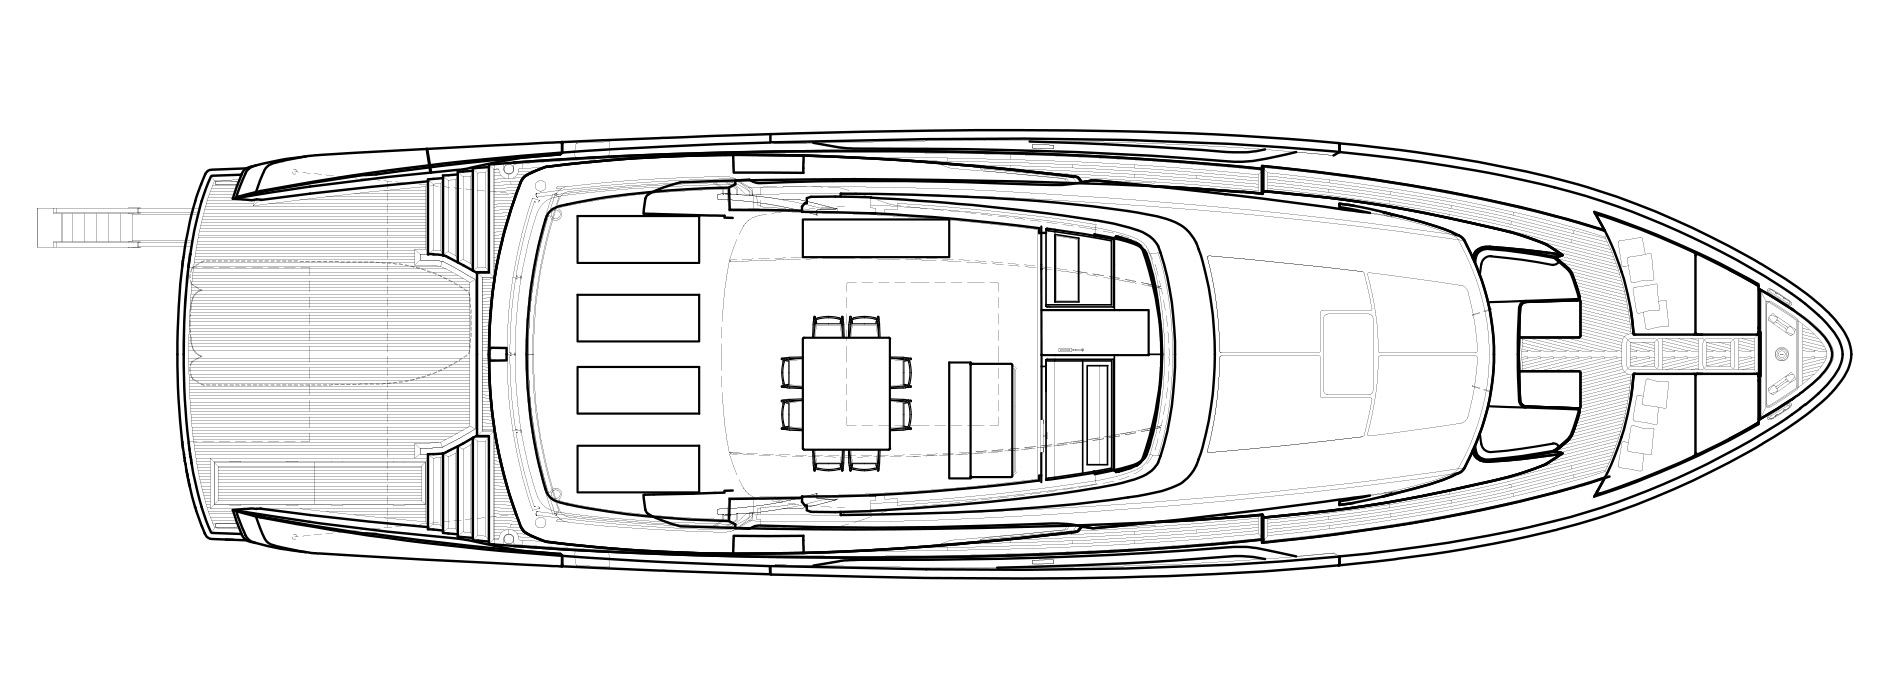 Sanlorenzo Yachts SX88 飞桥 Versione C